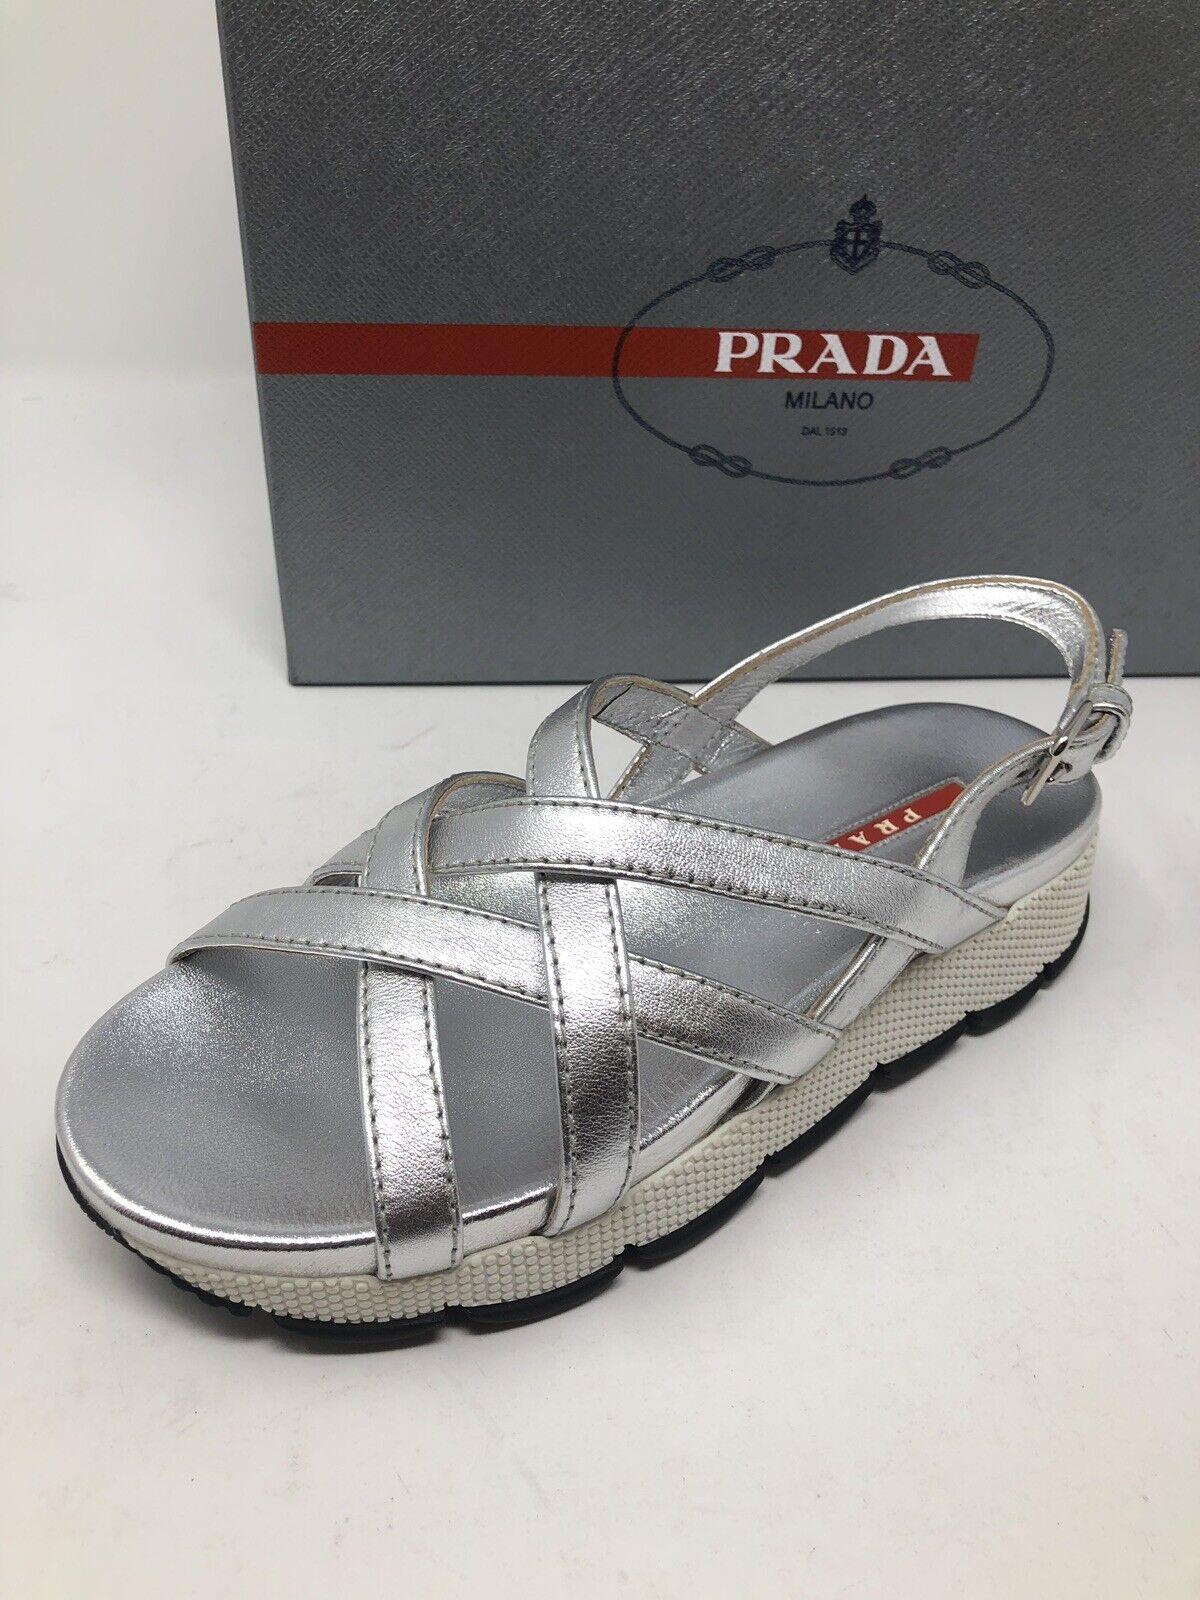 595 New PRADA Womens Silver Sandals Ladies shoes Size 6 US 36 EU